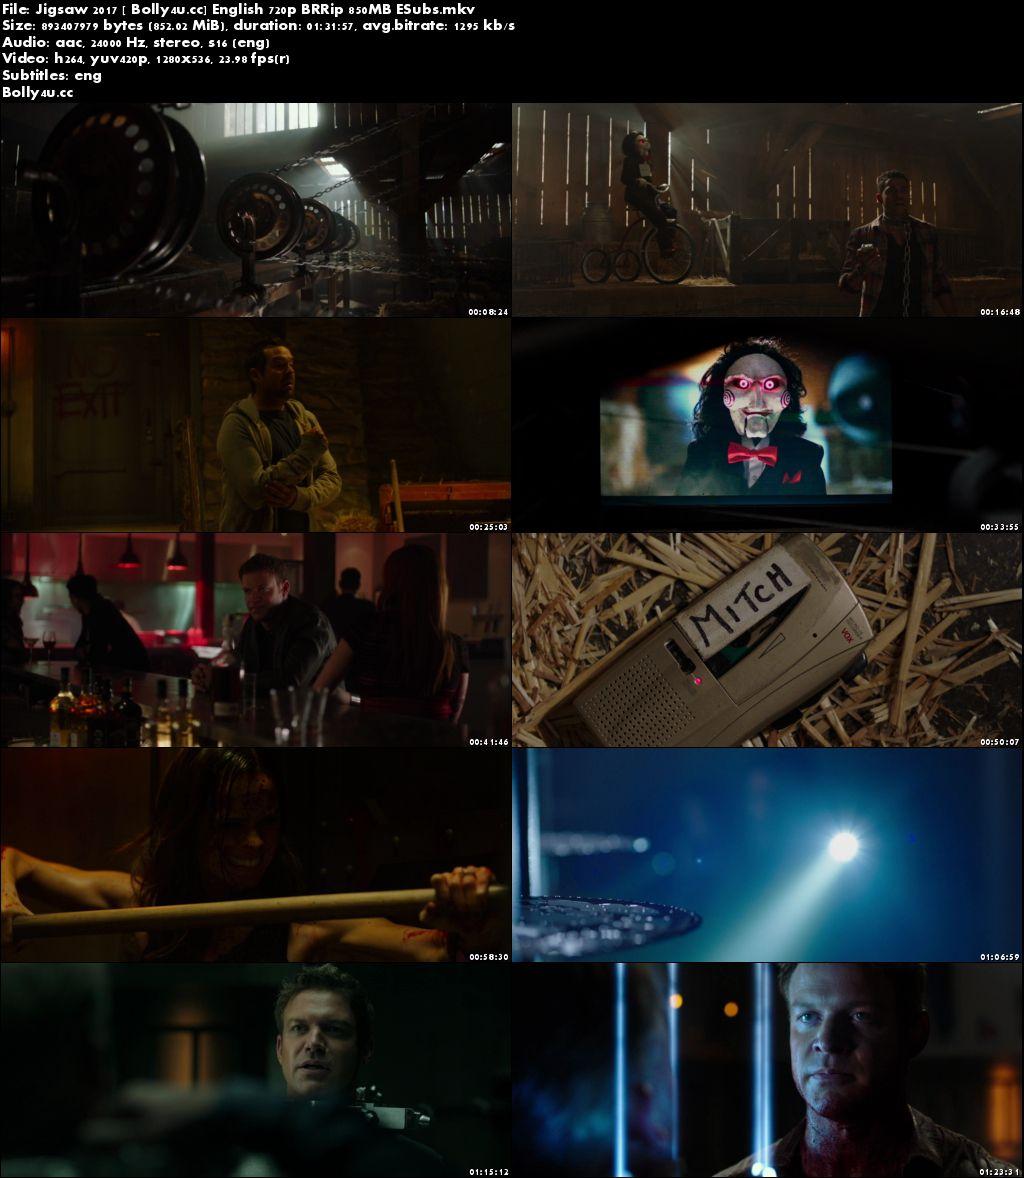 Jigsaw 2017 BluRay 850MB English 720p ESubs Download